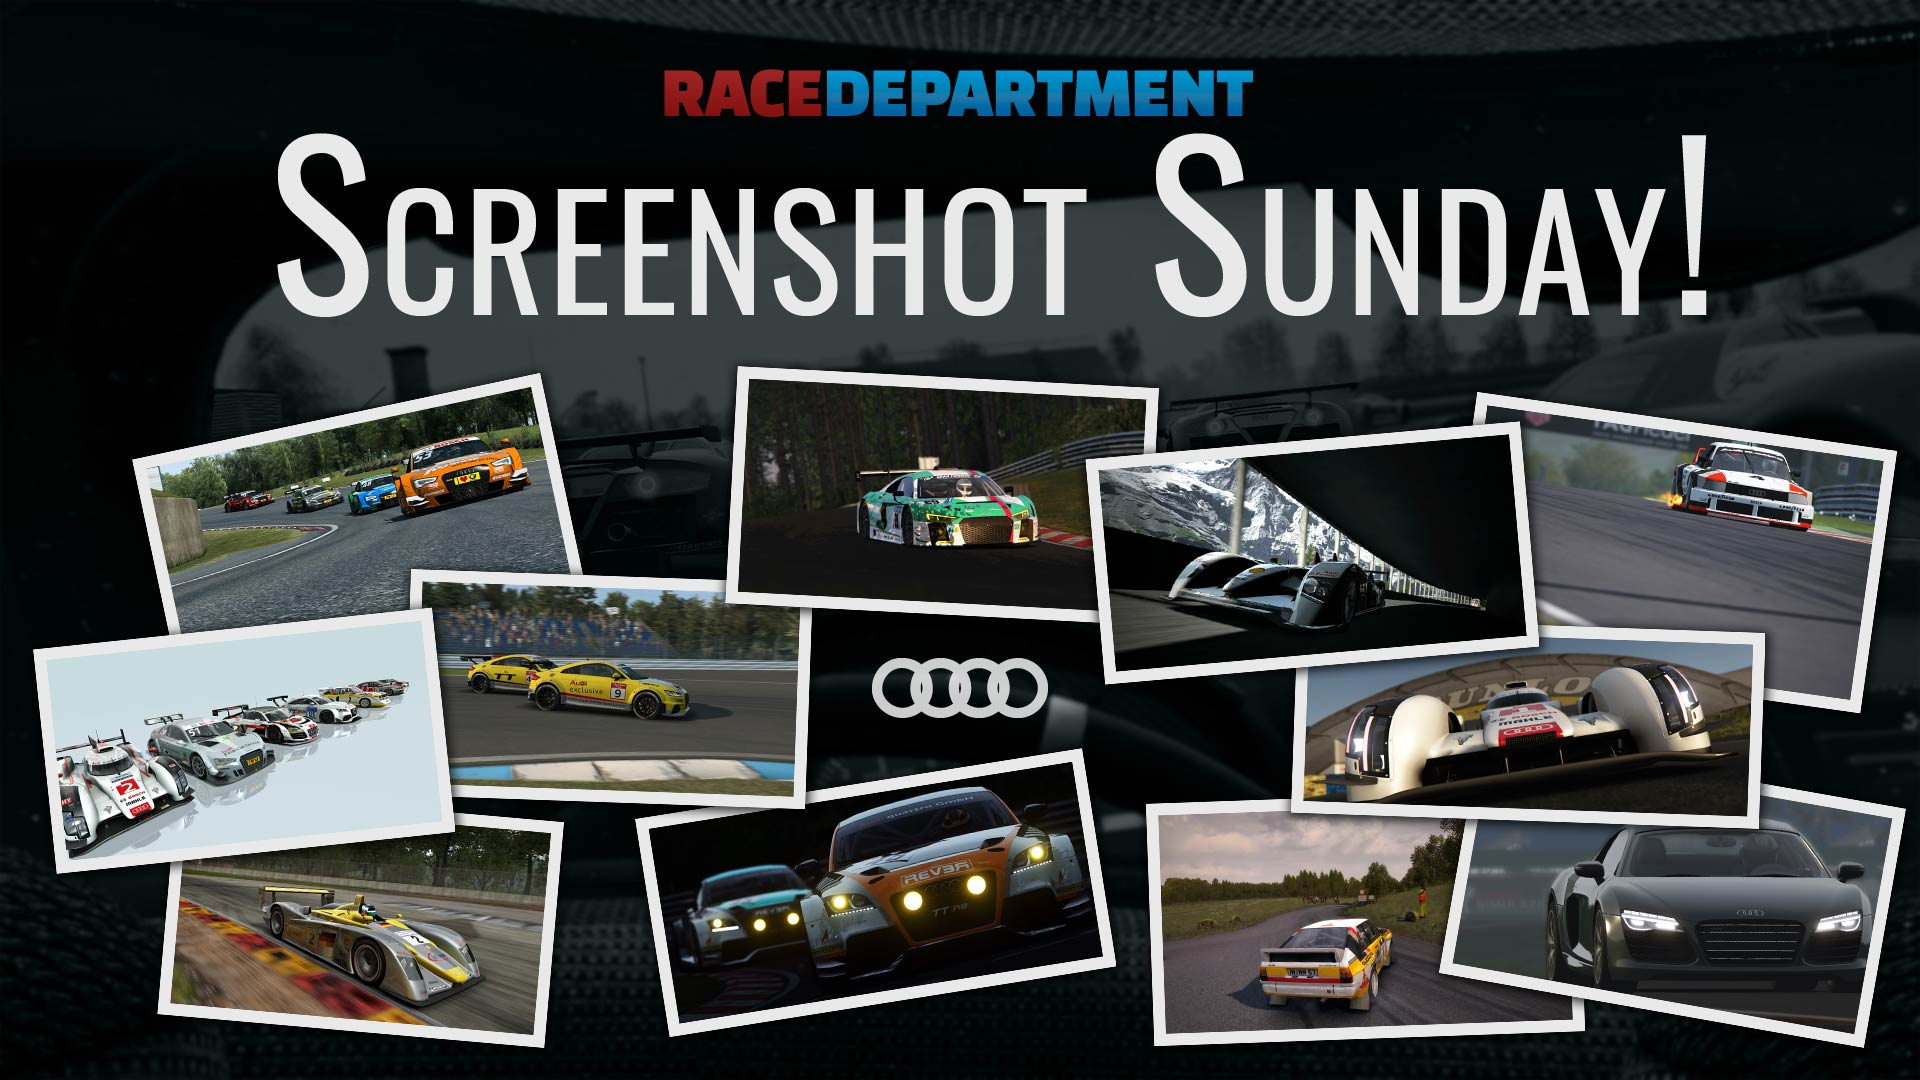 Screenshot Sunday - Audi.jpg